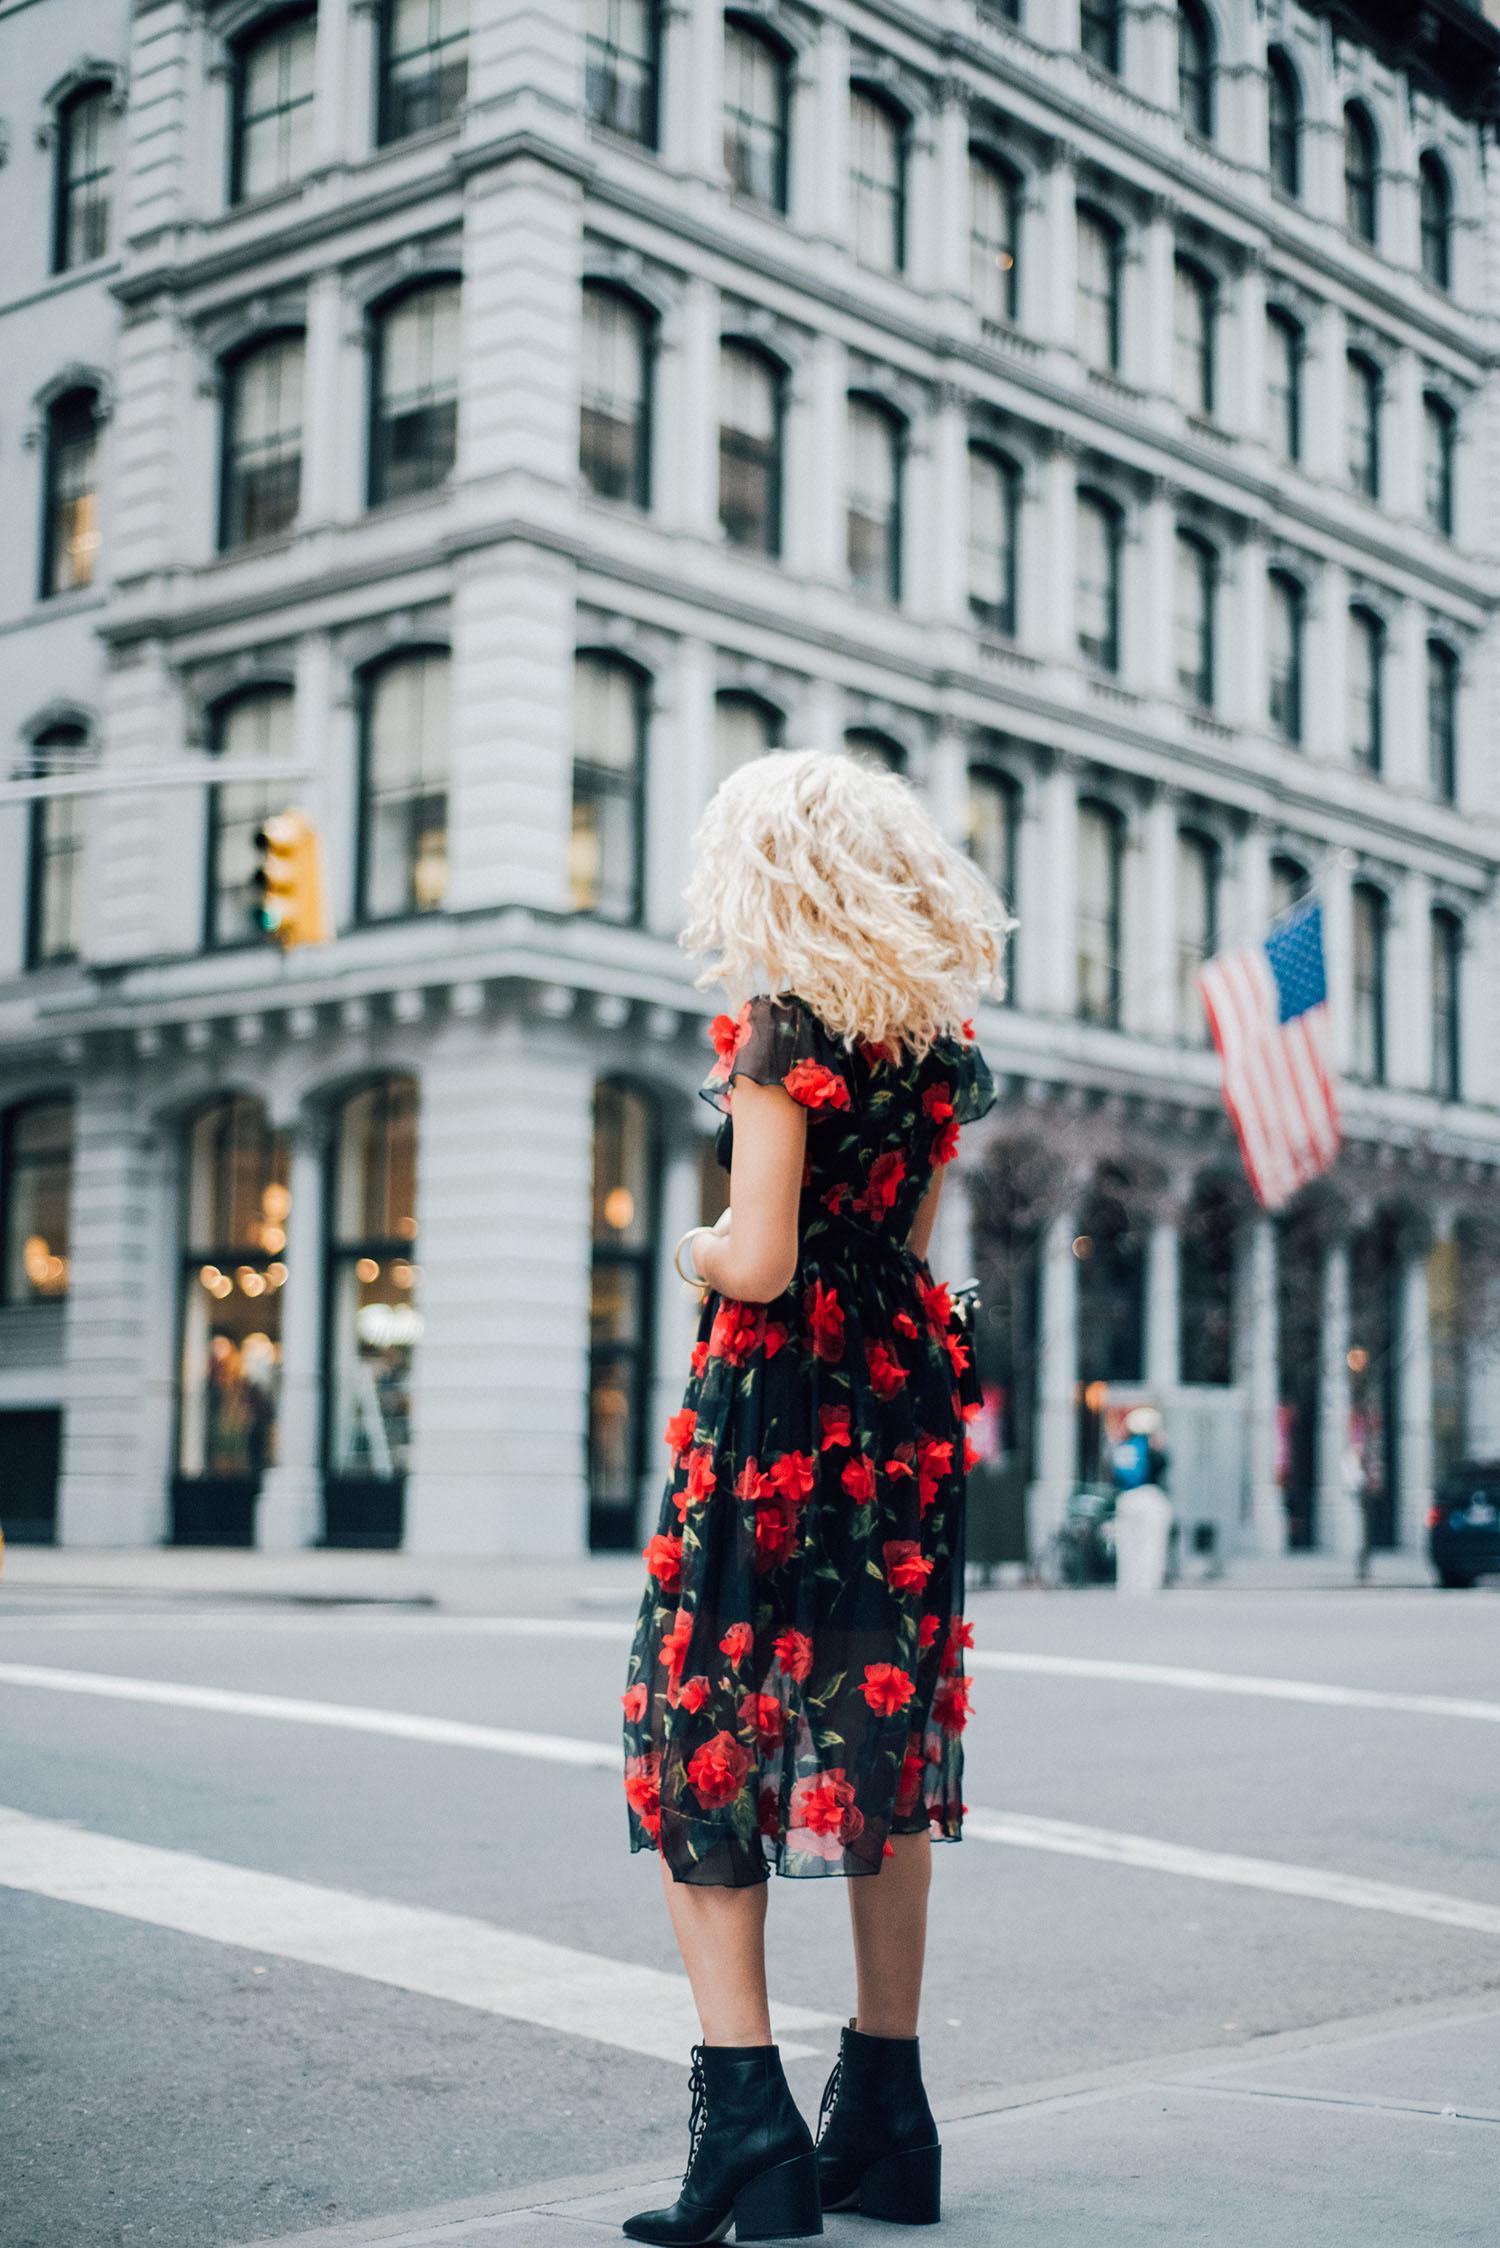 blonde-hair-nyc-street-rose-dress-stock-image.jpg